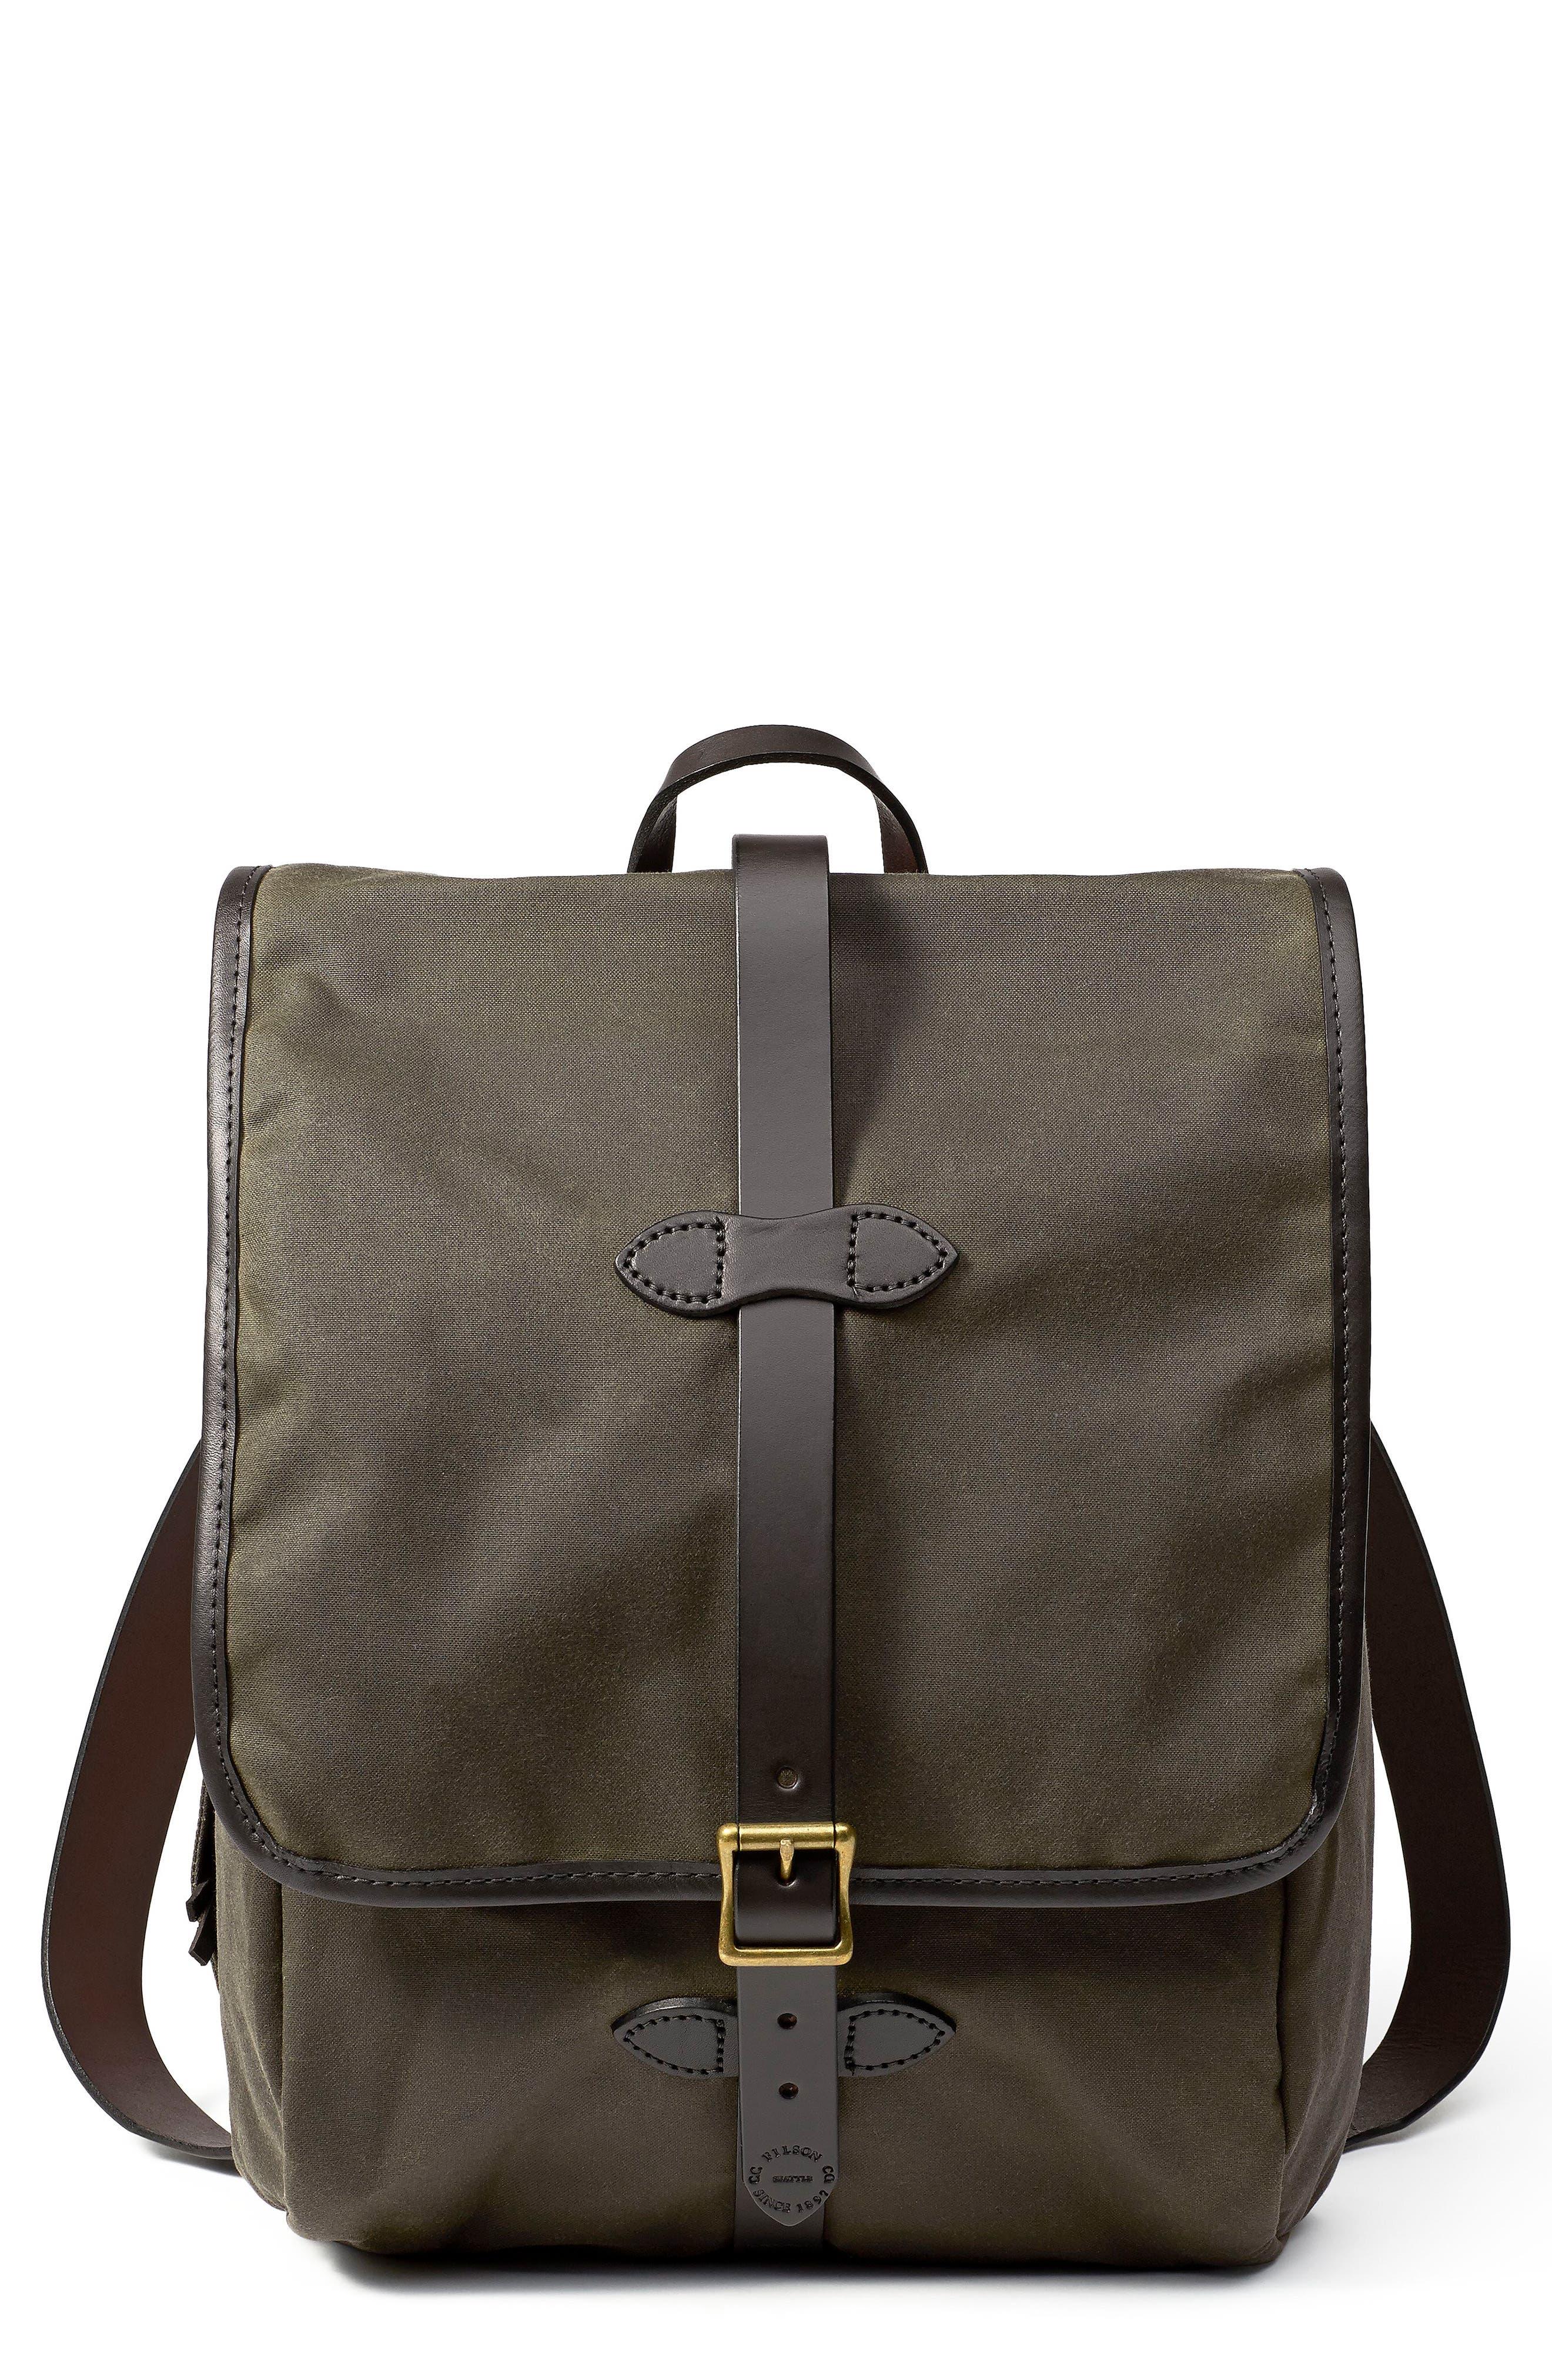 Tin Cloth Backpack,                             Main thumbnail 1, color,                             Otter Green